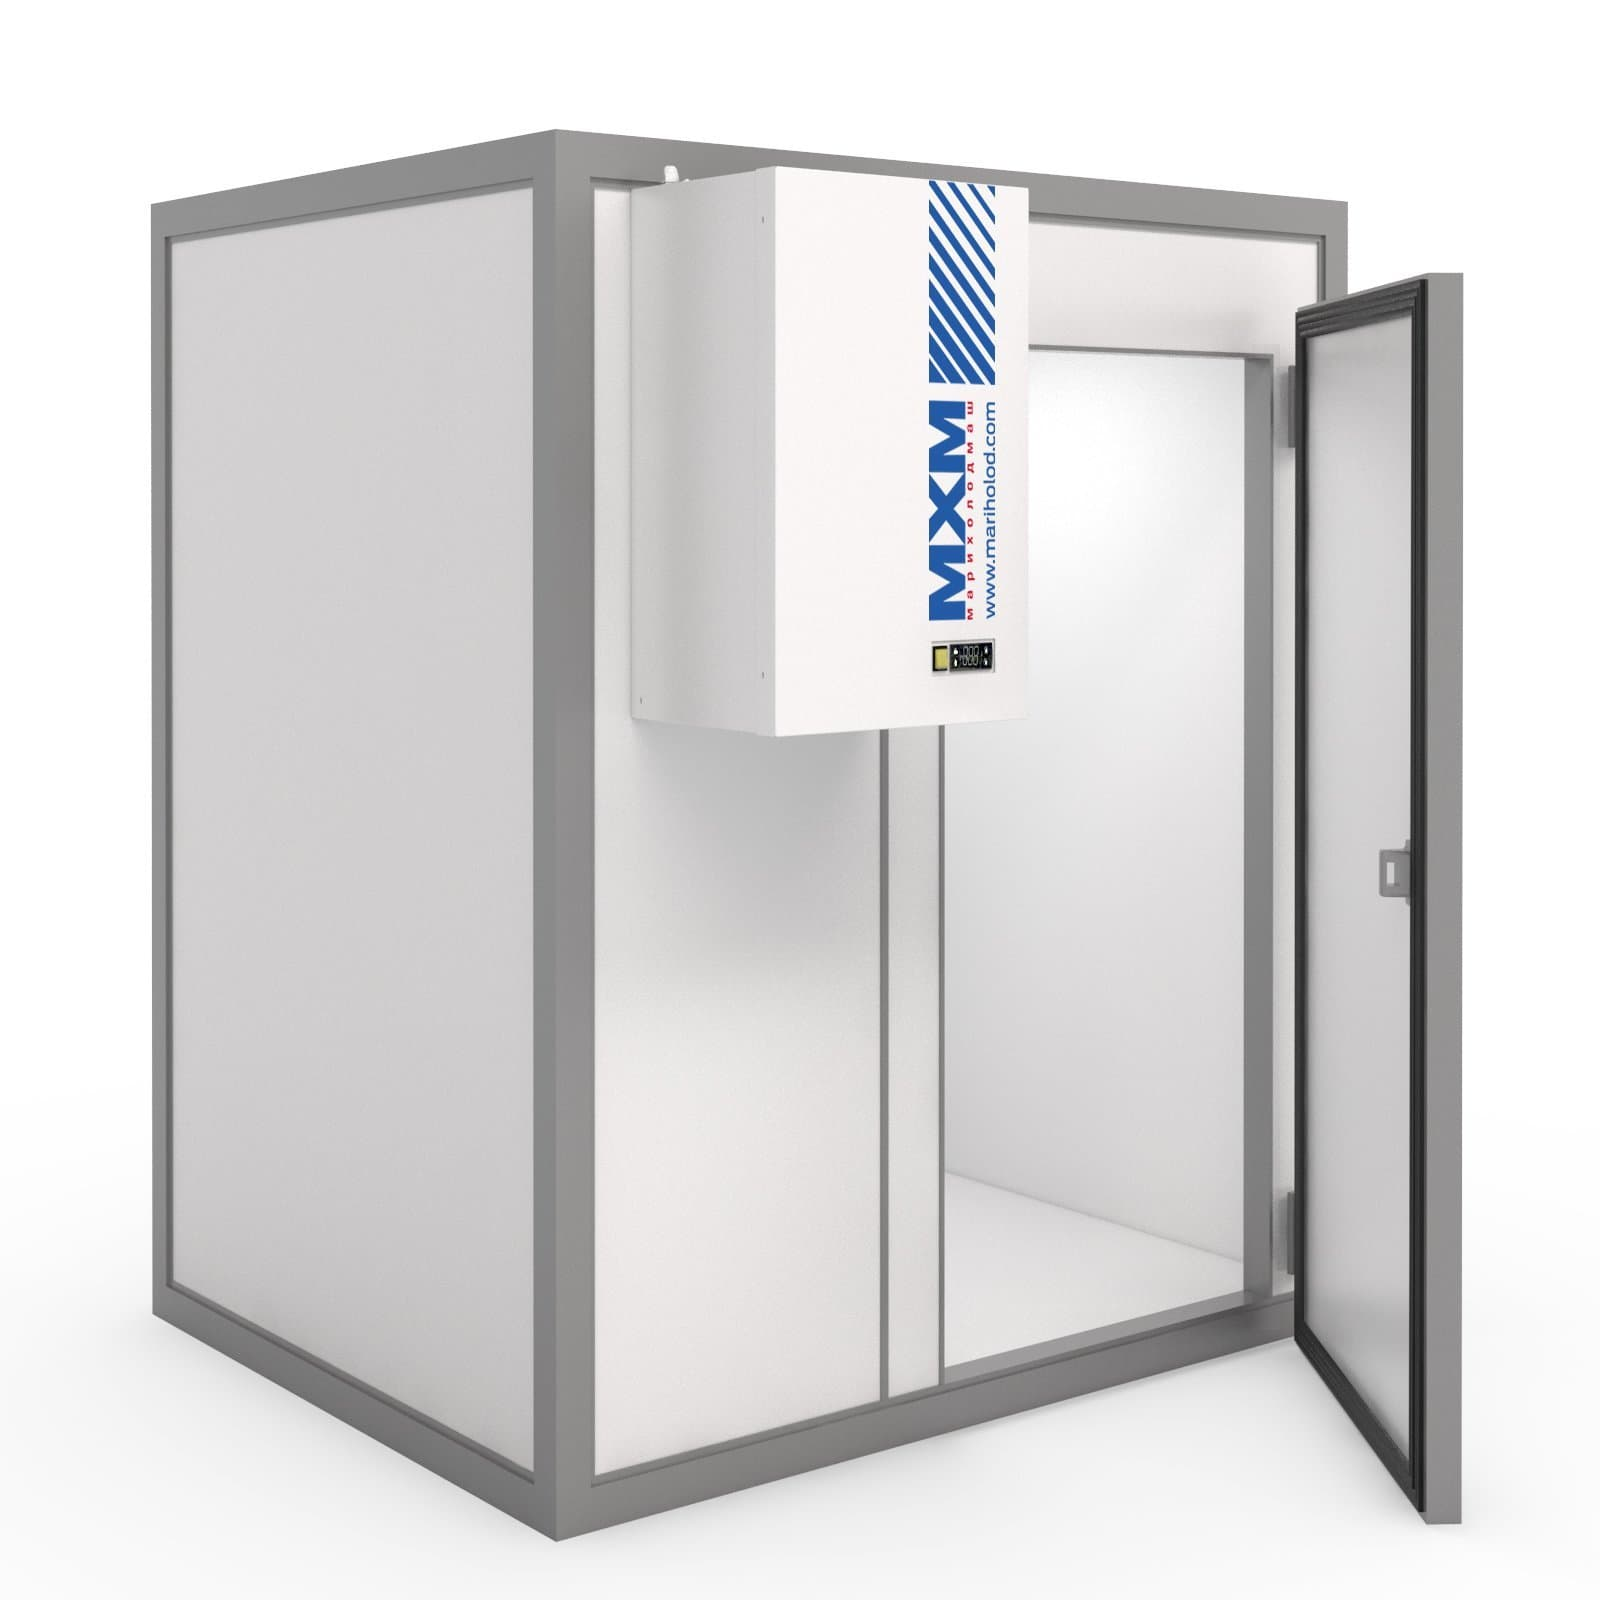 Камера холодильная МХМ КХН-39,74 1360×14560×2460